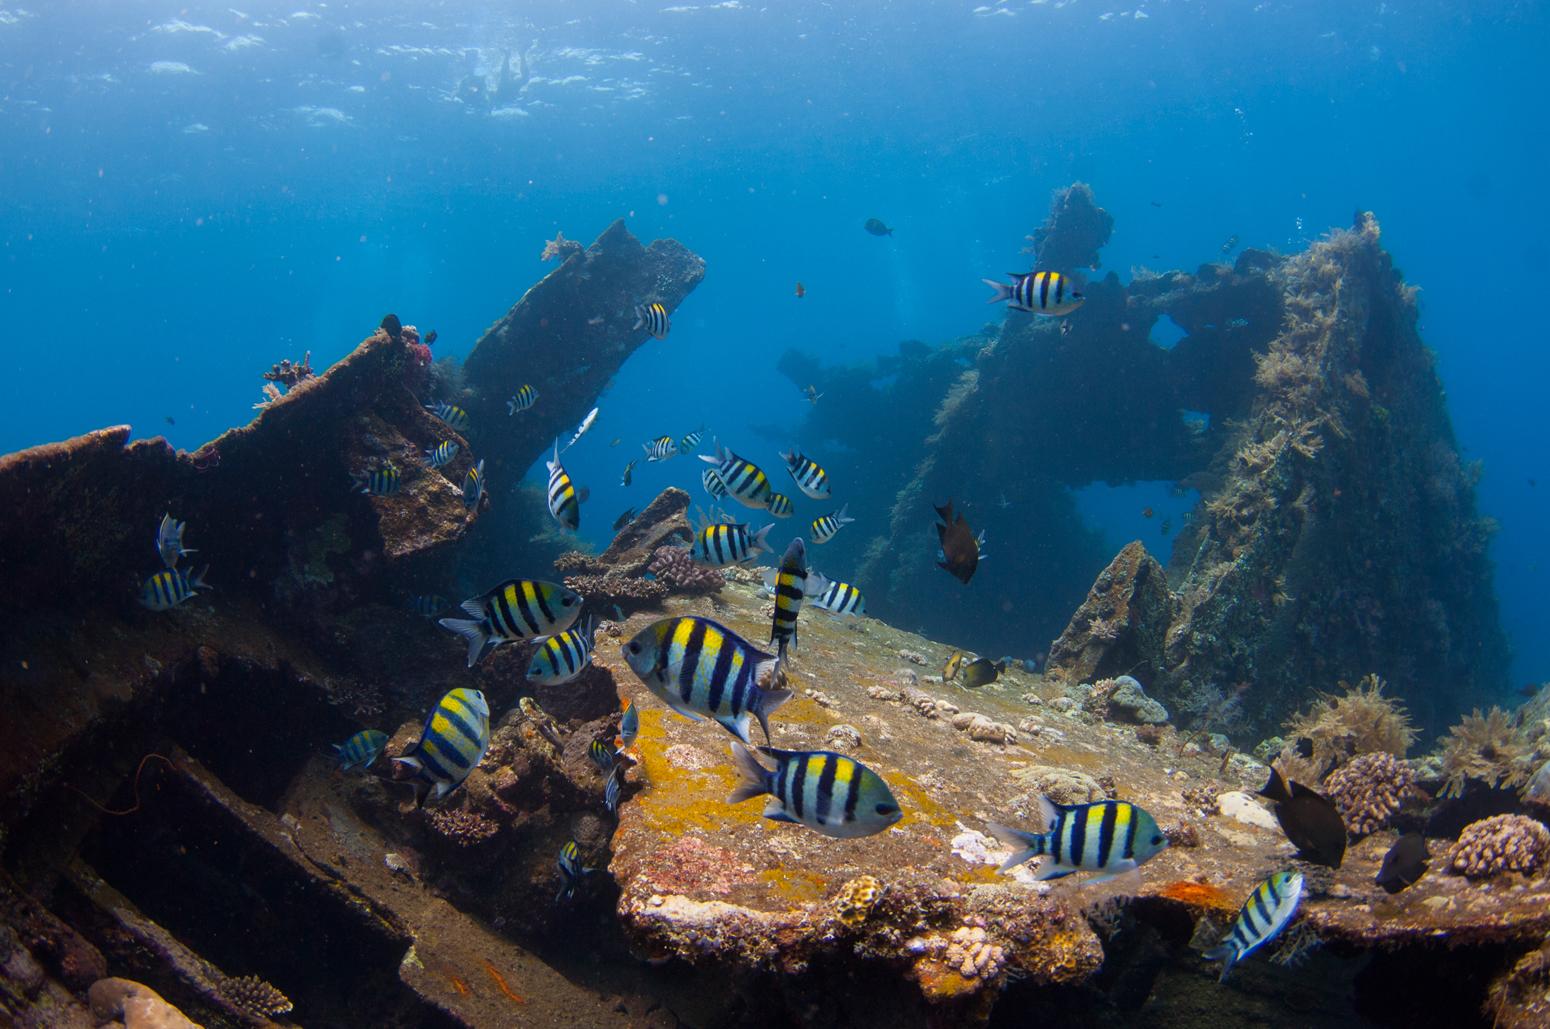 Bali's Tulamben: Muck Diving Heaven | X-Ray Mag